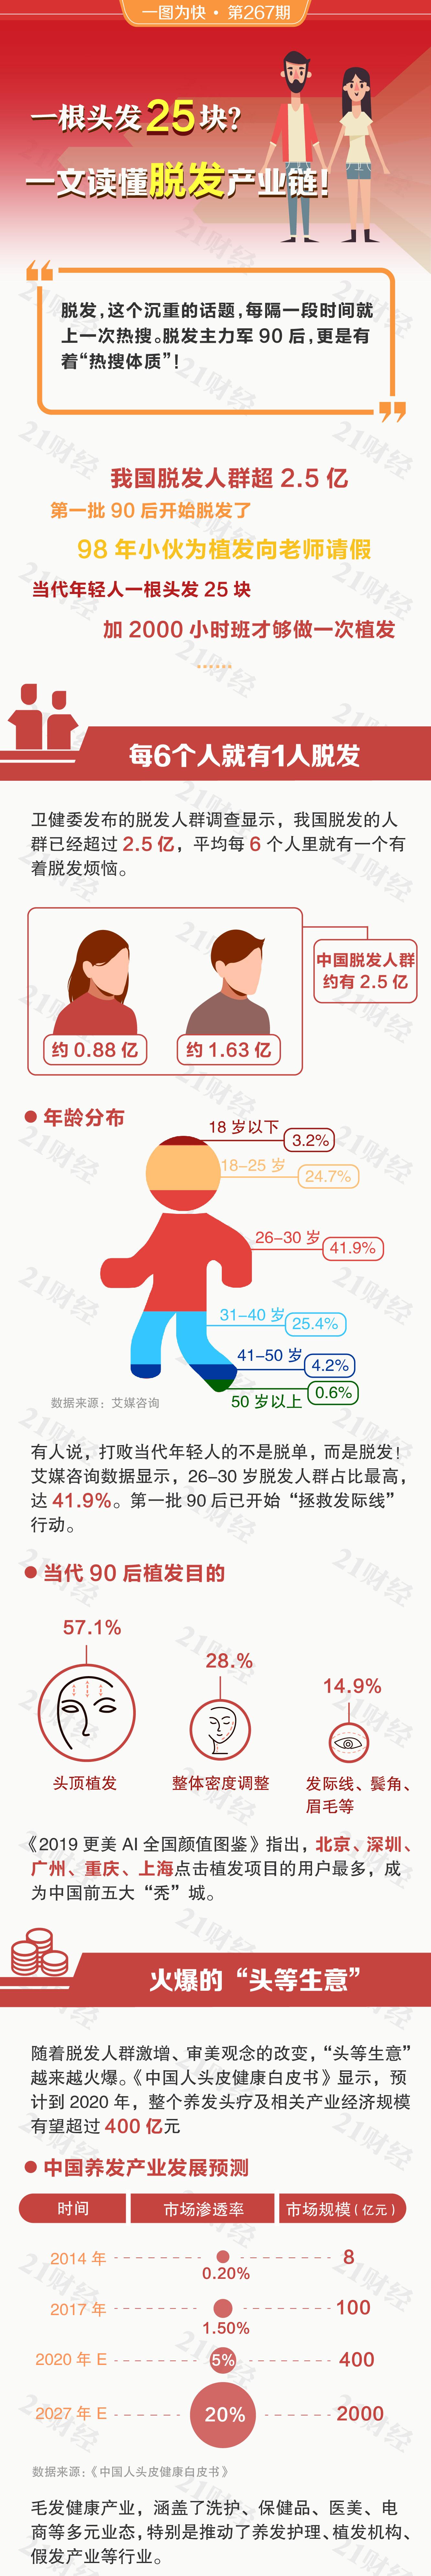 "88.com·徐州幼儿师范高等专科学校:为实现""幼有所育""培养优秀幼师"